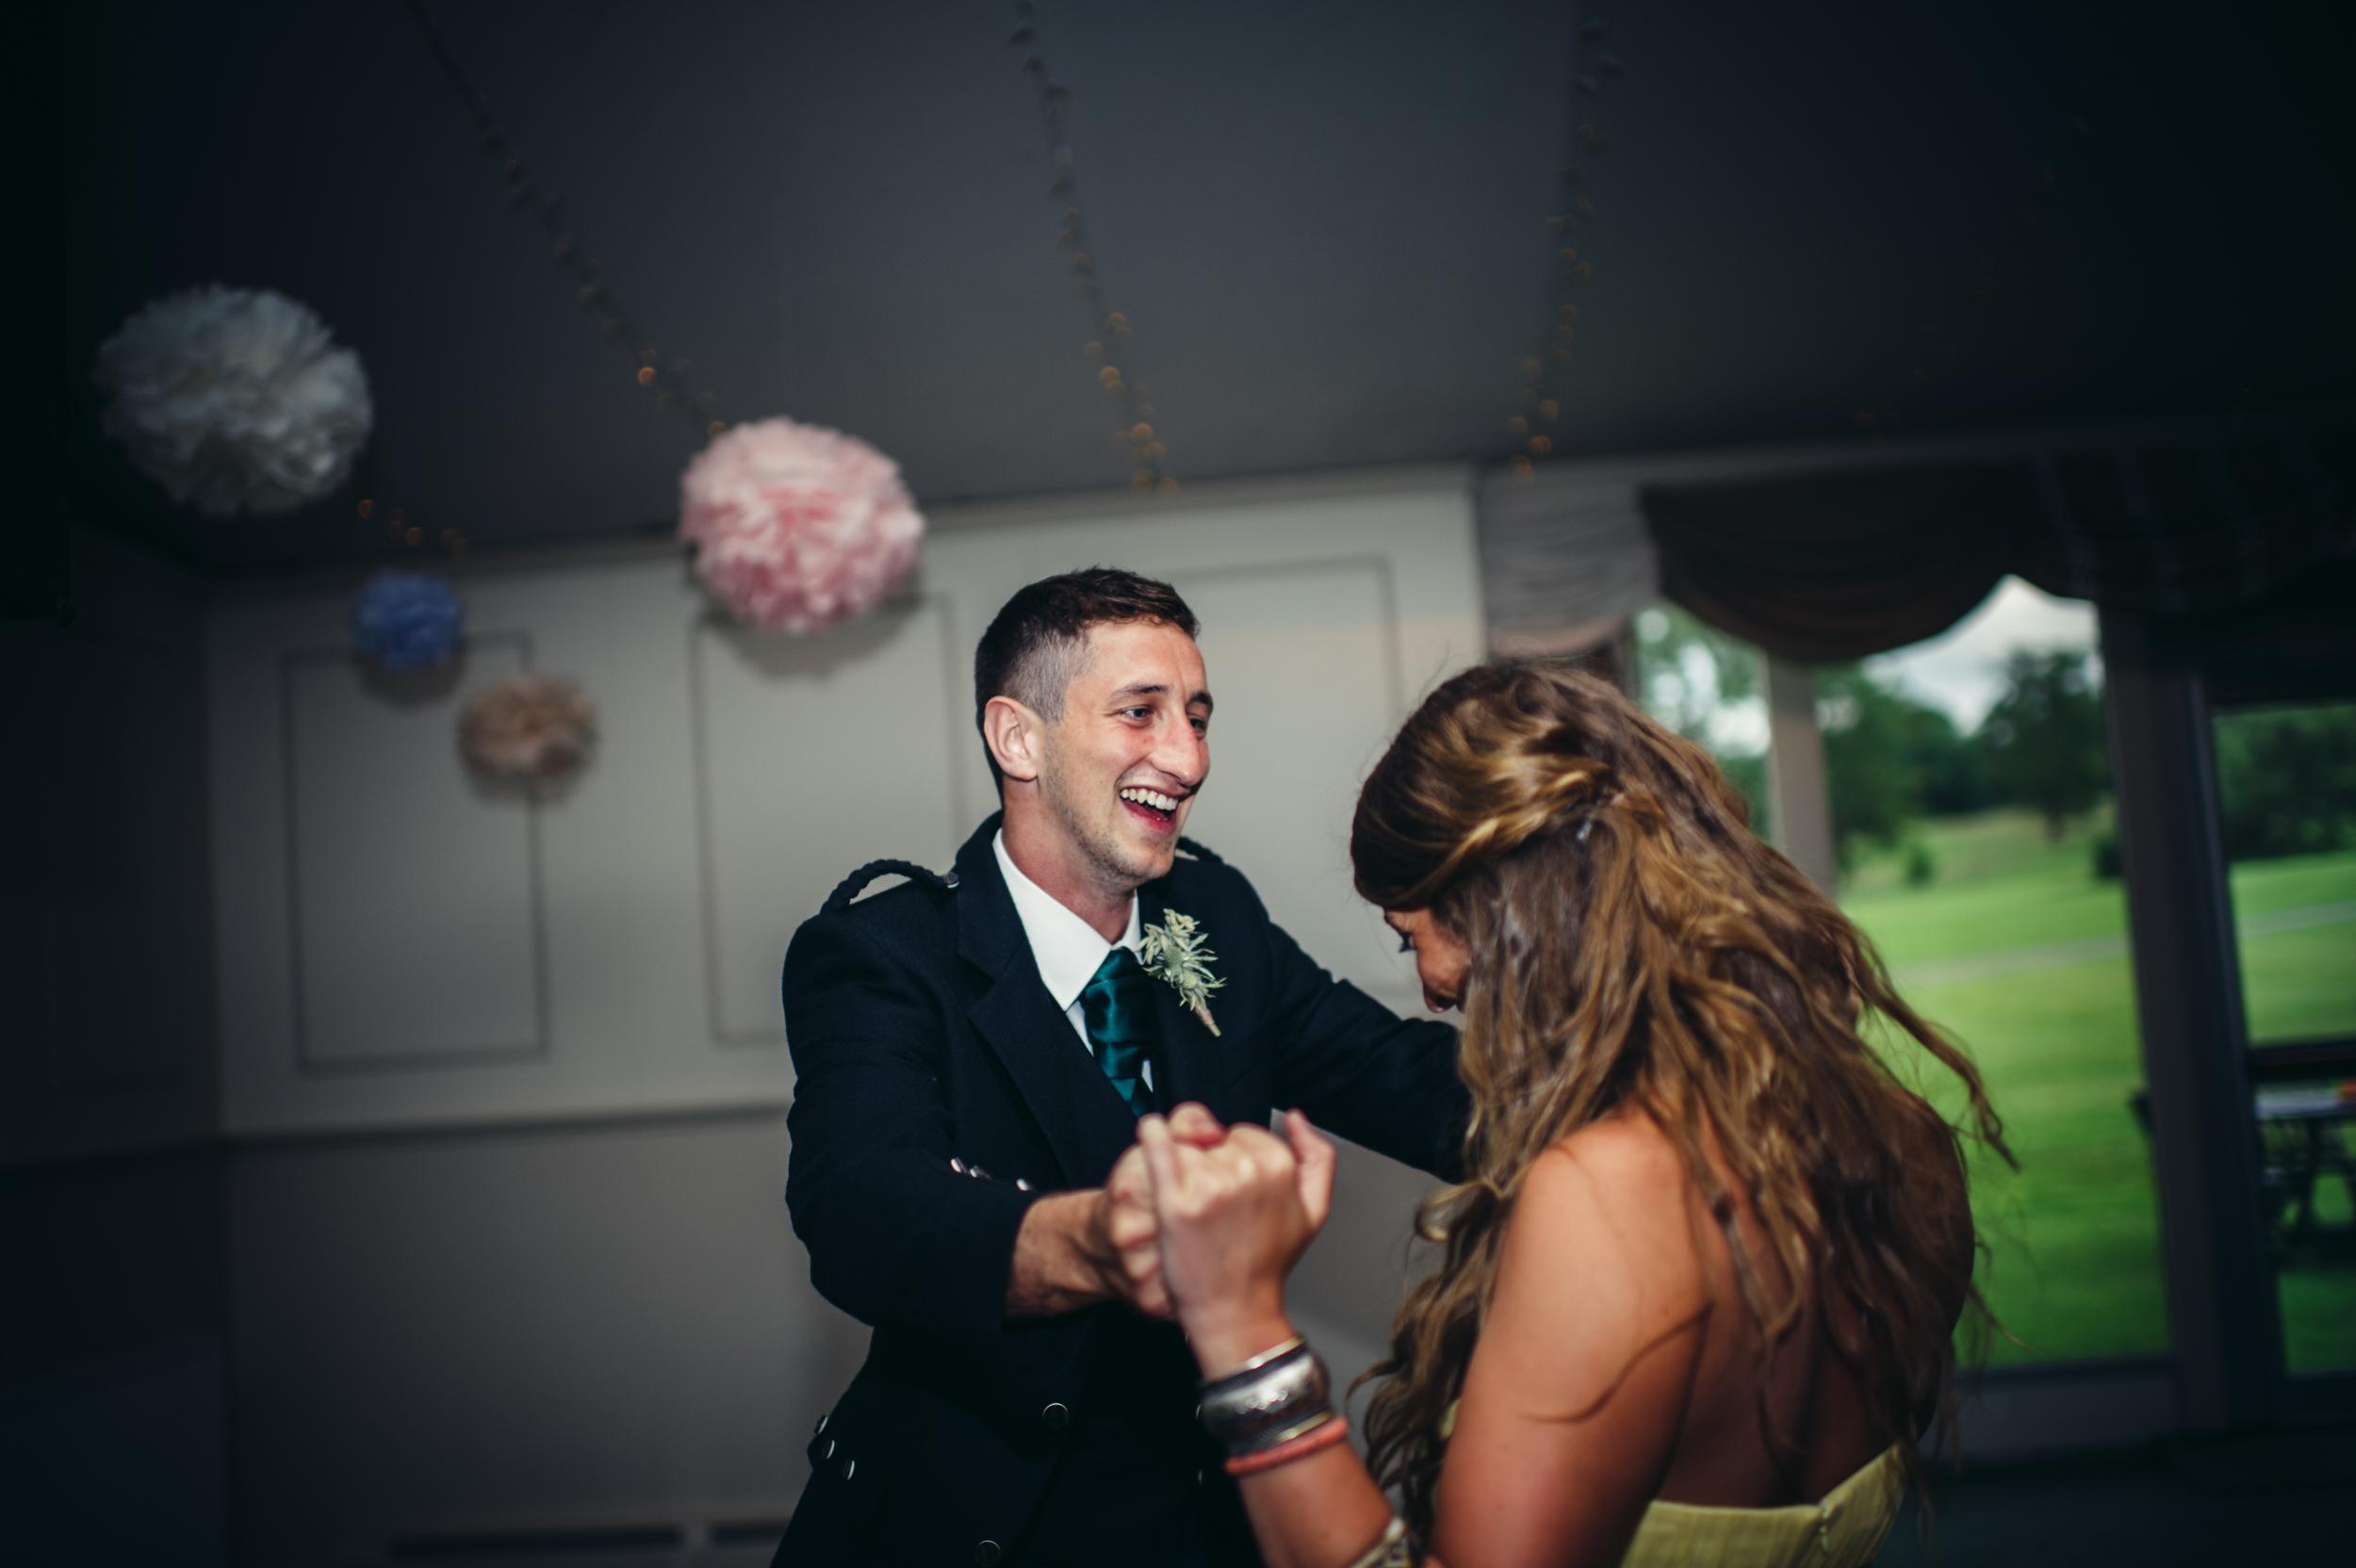 0187-lisa-devine-alternative-creative-wedding-photography-glasgow-edinburgh.JPG